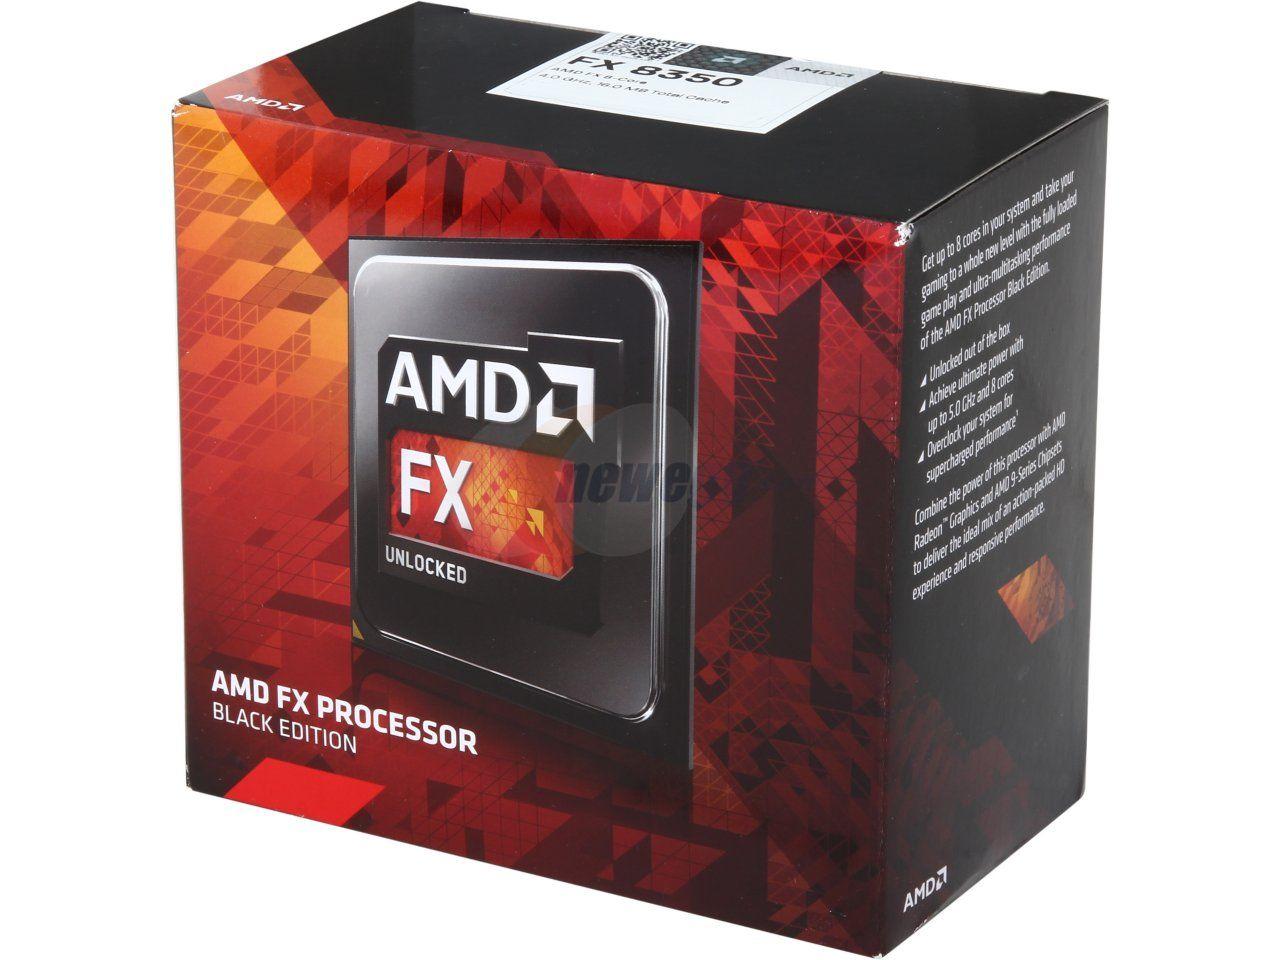 AMD Processor FX-8350 Black Edition Vishera 8-Core 4.0GHz (4.2GHz Turbo) Socket AM3+ 125W D8350FRHKBOX - Newegg.com